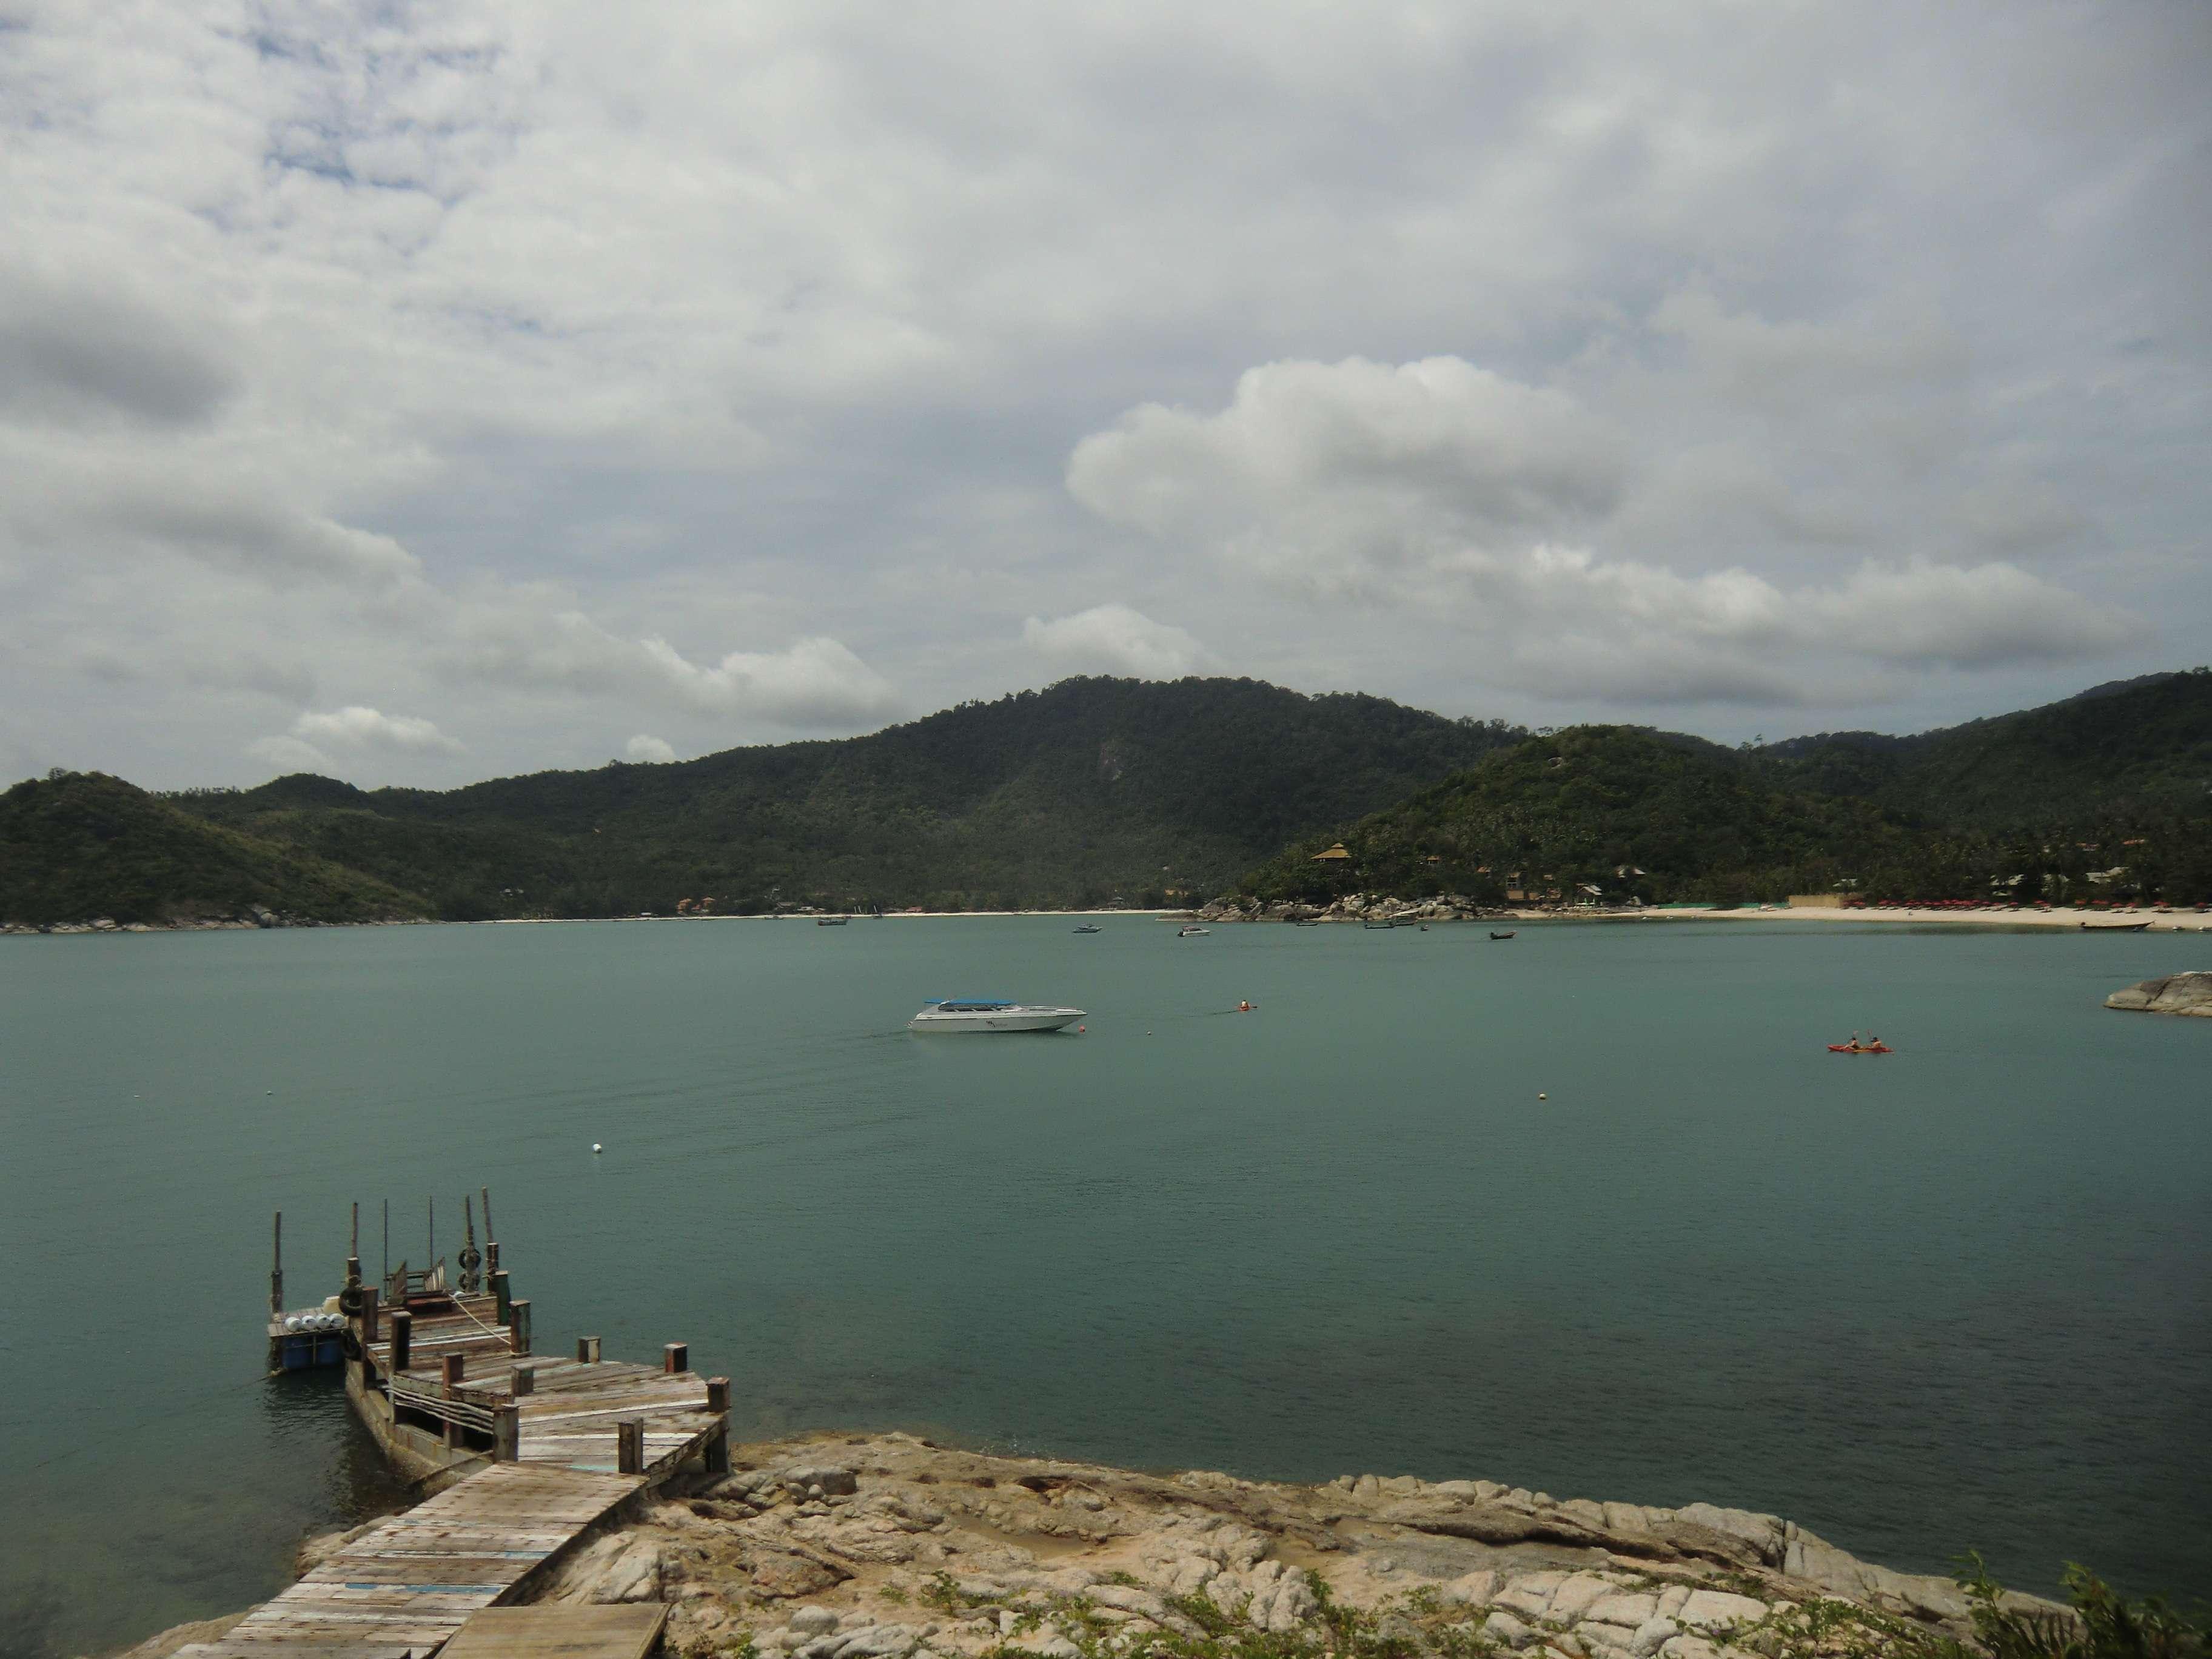 da hinten ist der Strand von Thong Nai Pan Yai